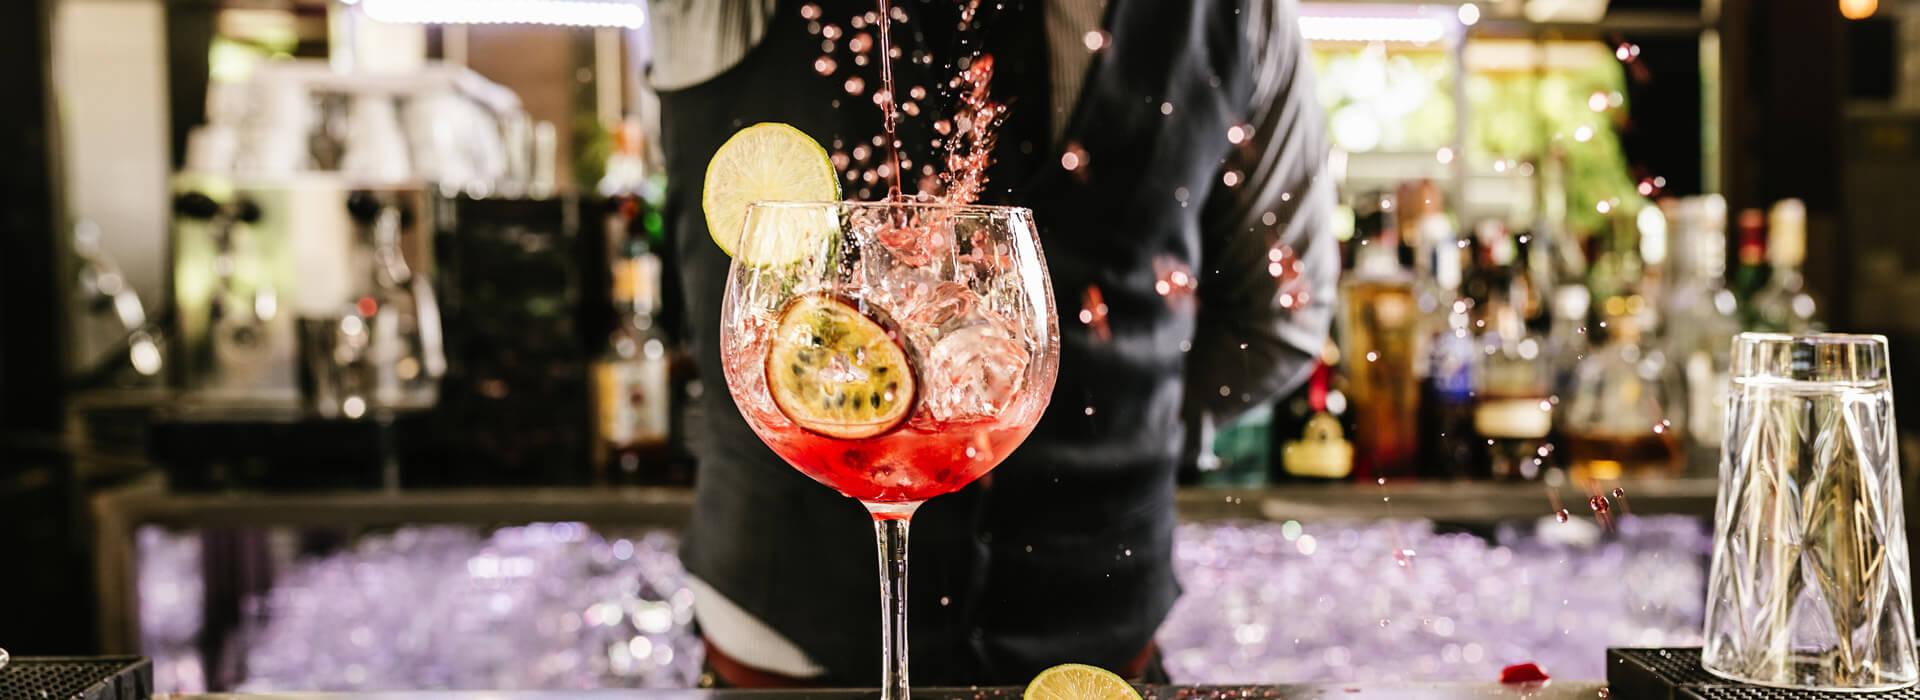 Cocktail bereiden barman evenement